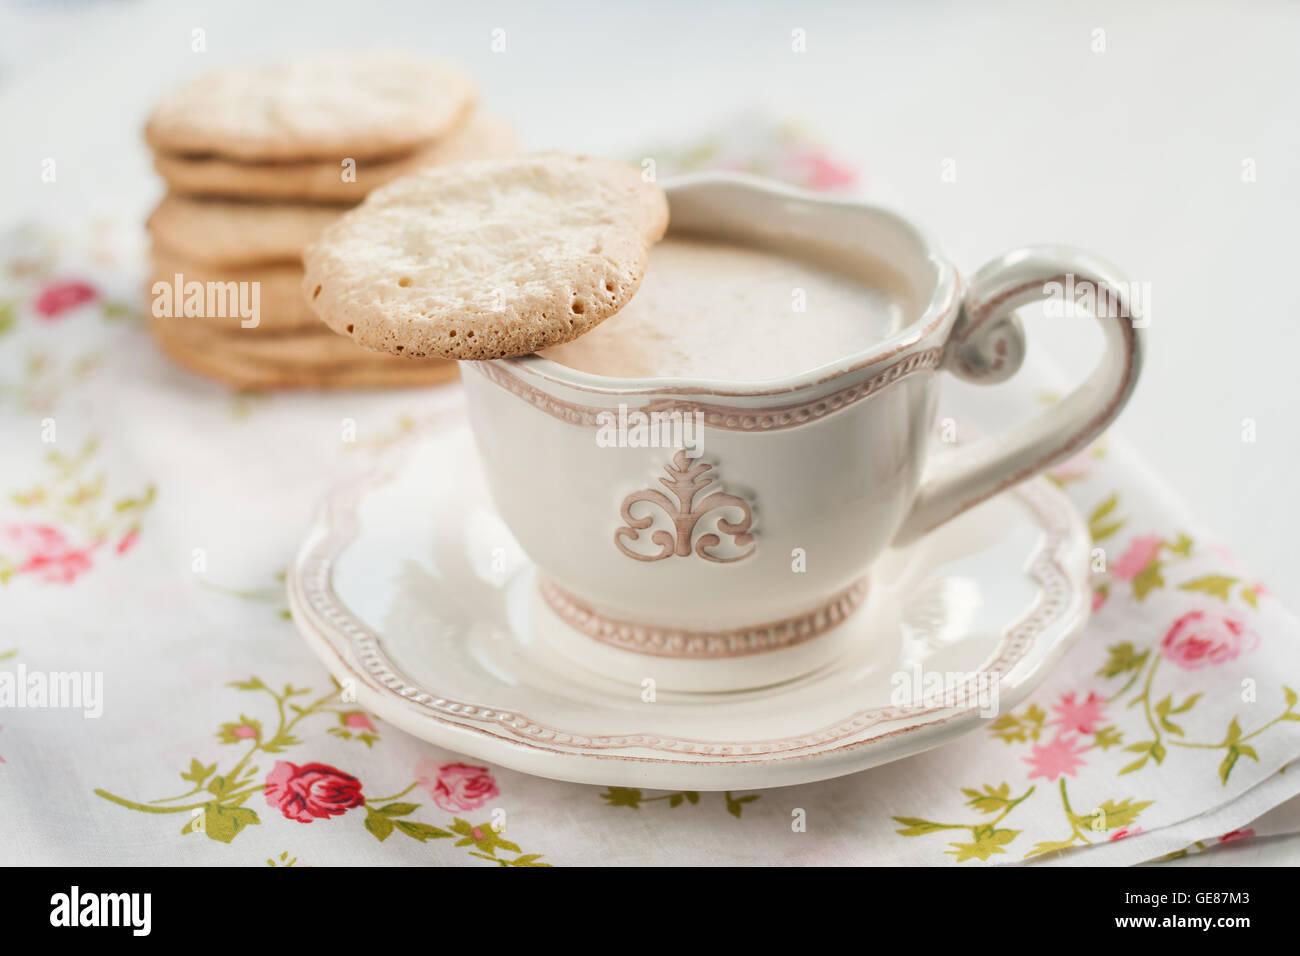 Vintage kitchenware - Stock Photo Flat Almond Biscuits Vintage Kitchenware In The Style Of Provence